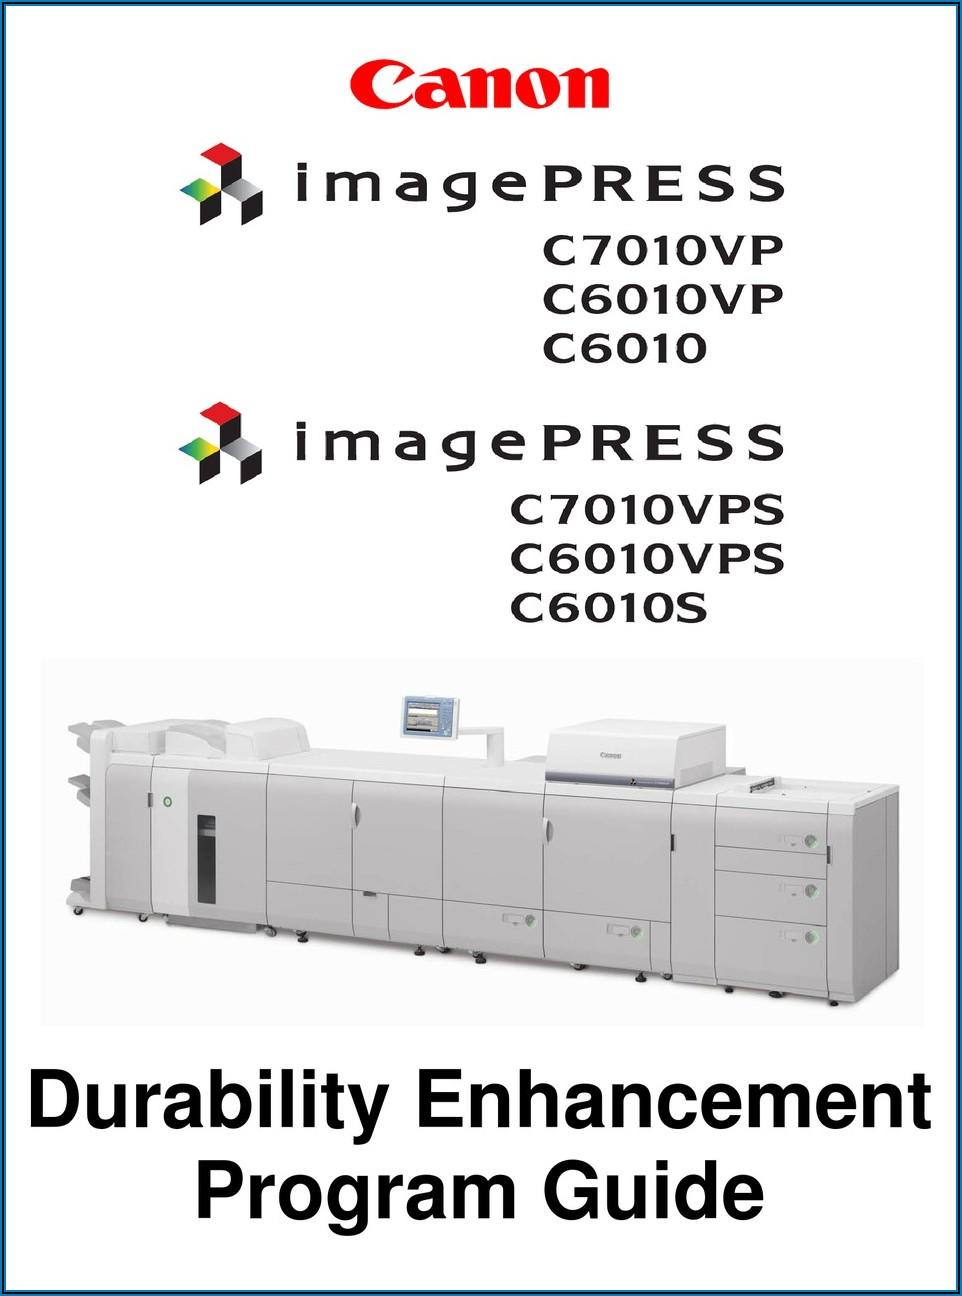 Canon Imagepress C7010vp Manual